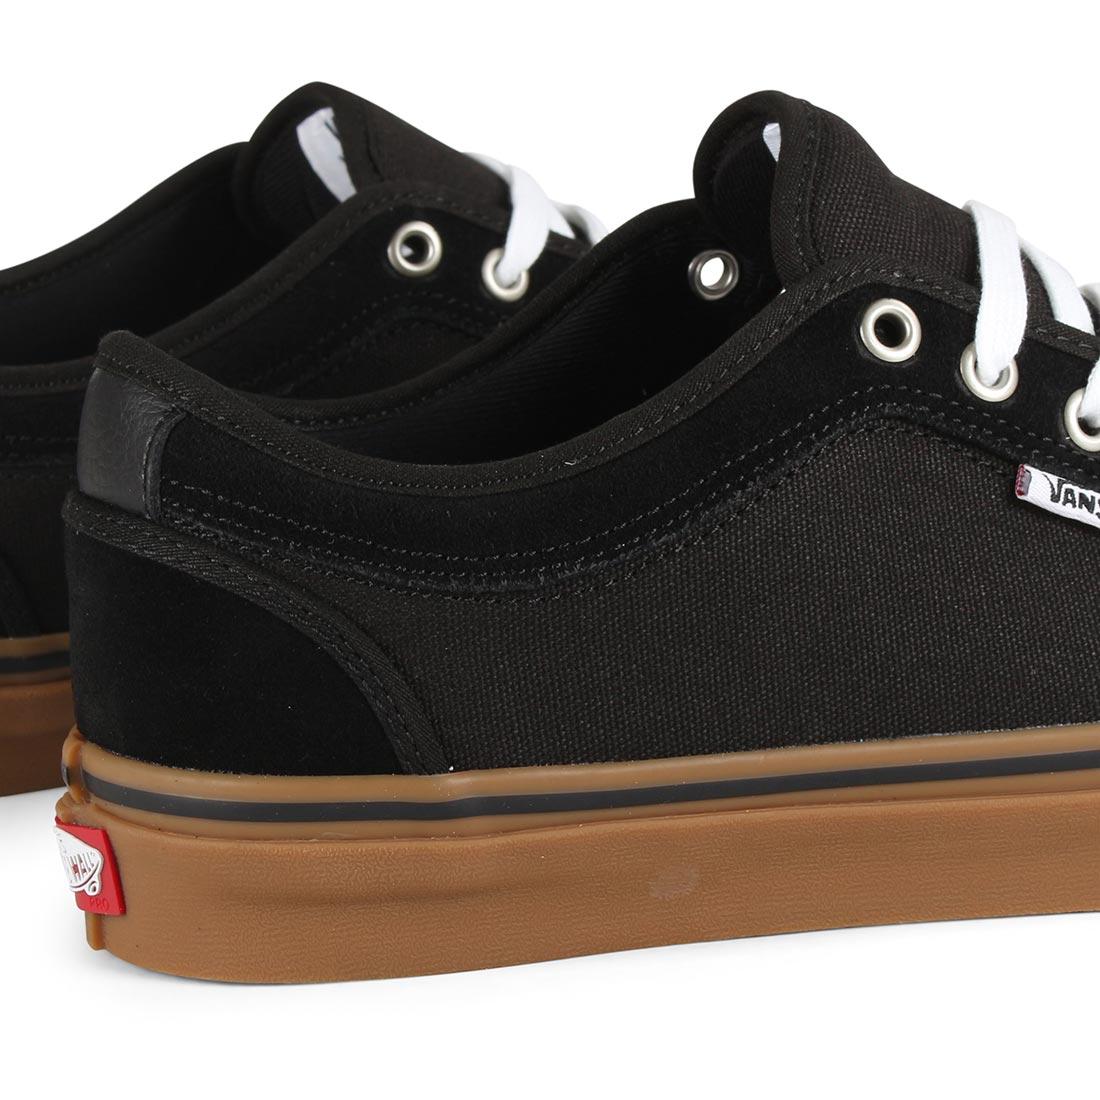 c4fa4f1948 Vans Chukka Low Pro Skate Shoes - Black   Black   Gum